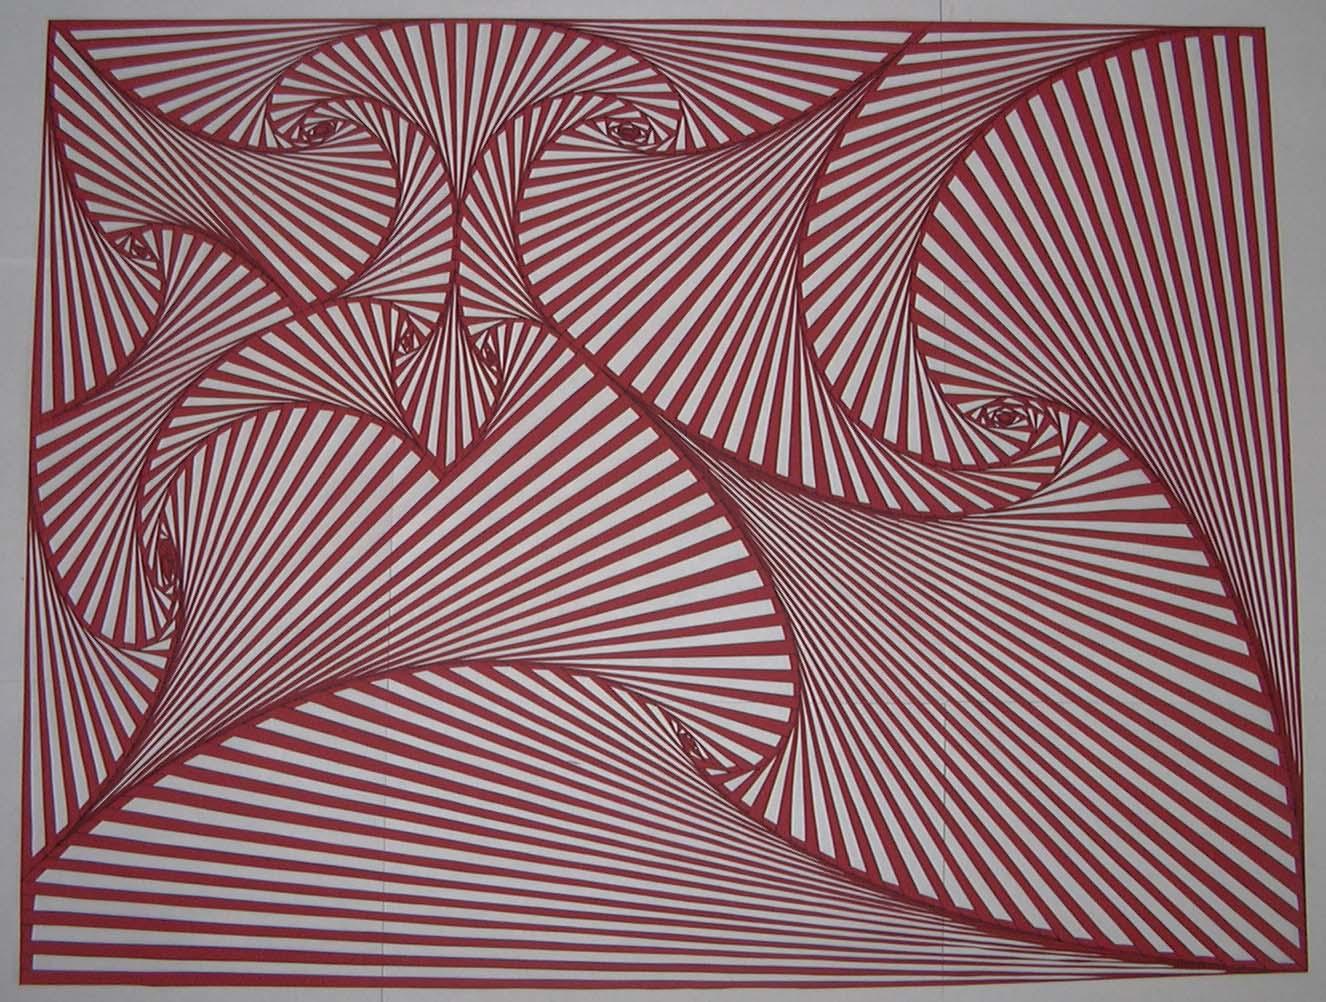 Lines Designs : Elements and principles of design averyjackson s